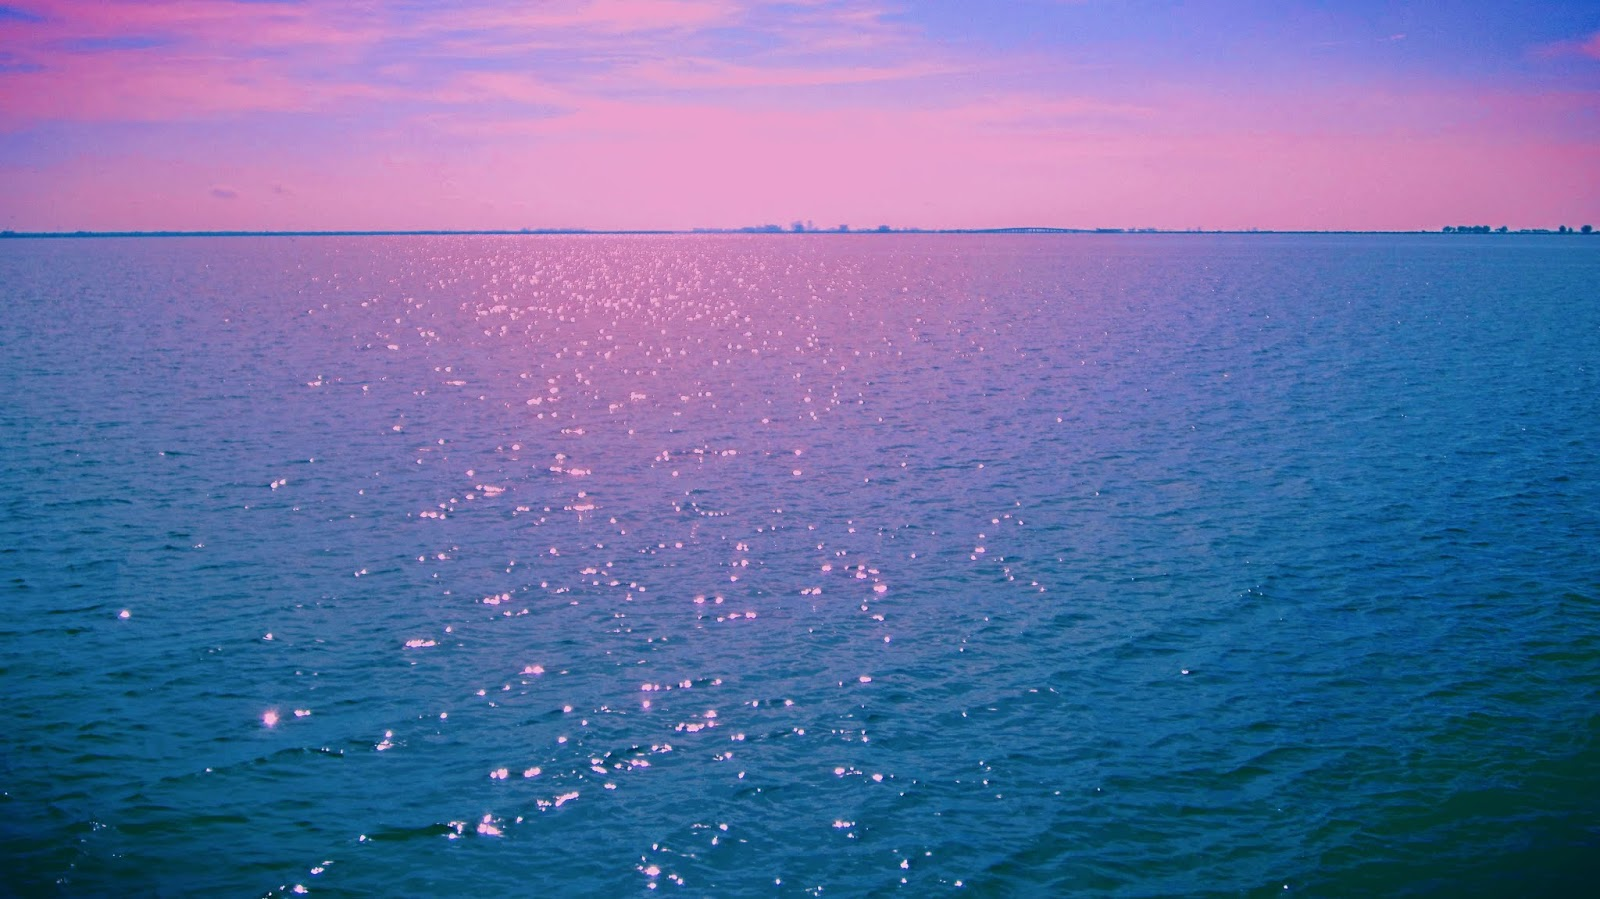 Sparkling Blue Ocean + Pink Bokeh Lights